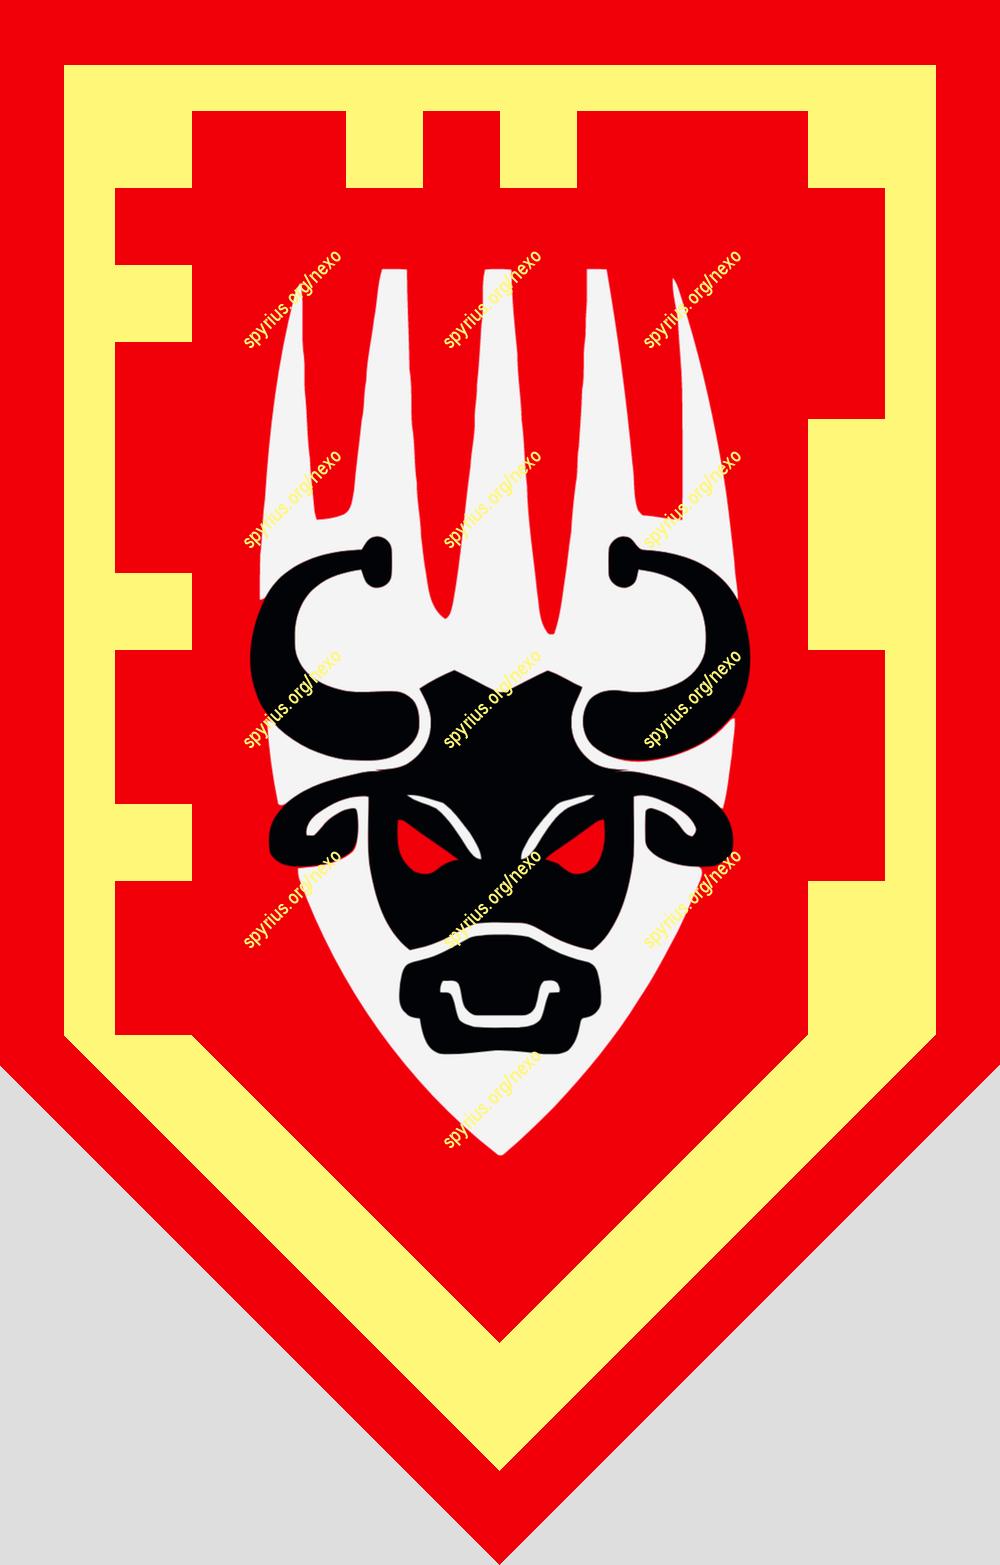 Lego Nexo Knights Power Macy Bull Race Spyrius Org